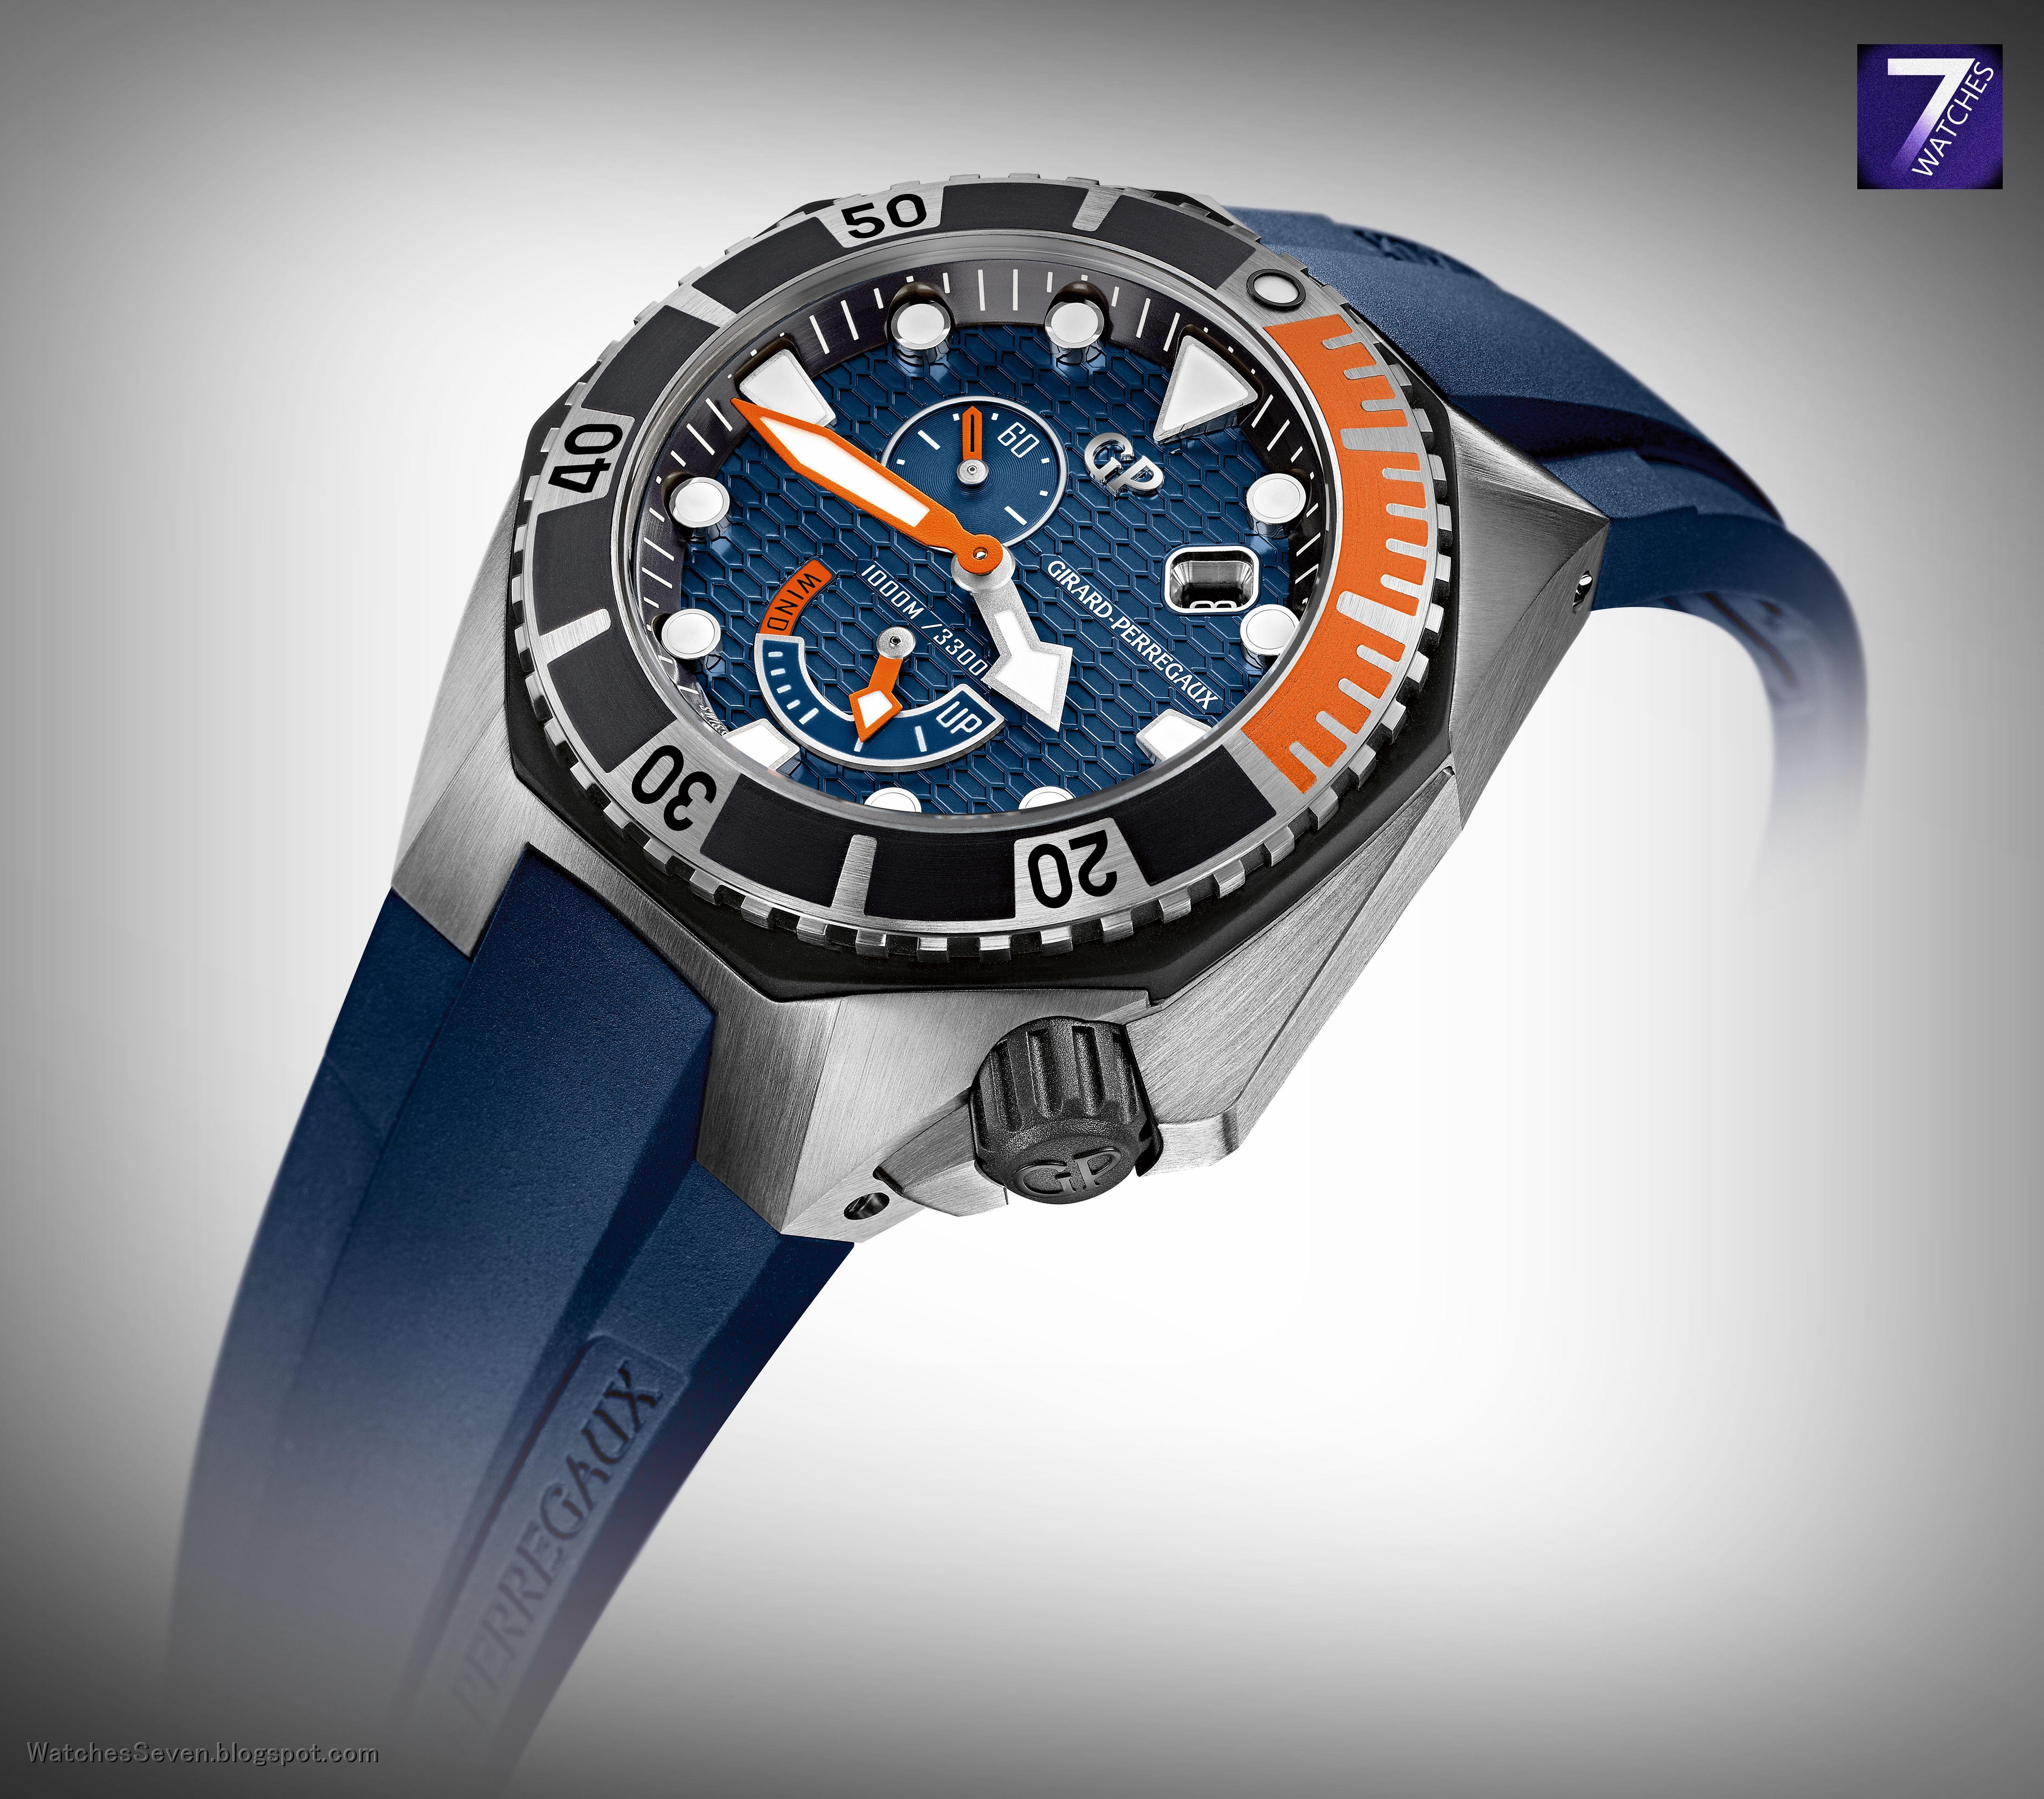 GIRARDPERREGAUX Sea Hawk Cobalt Blue Dial Reference